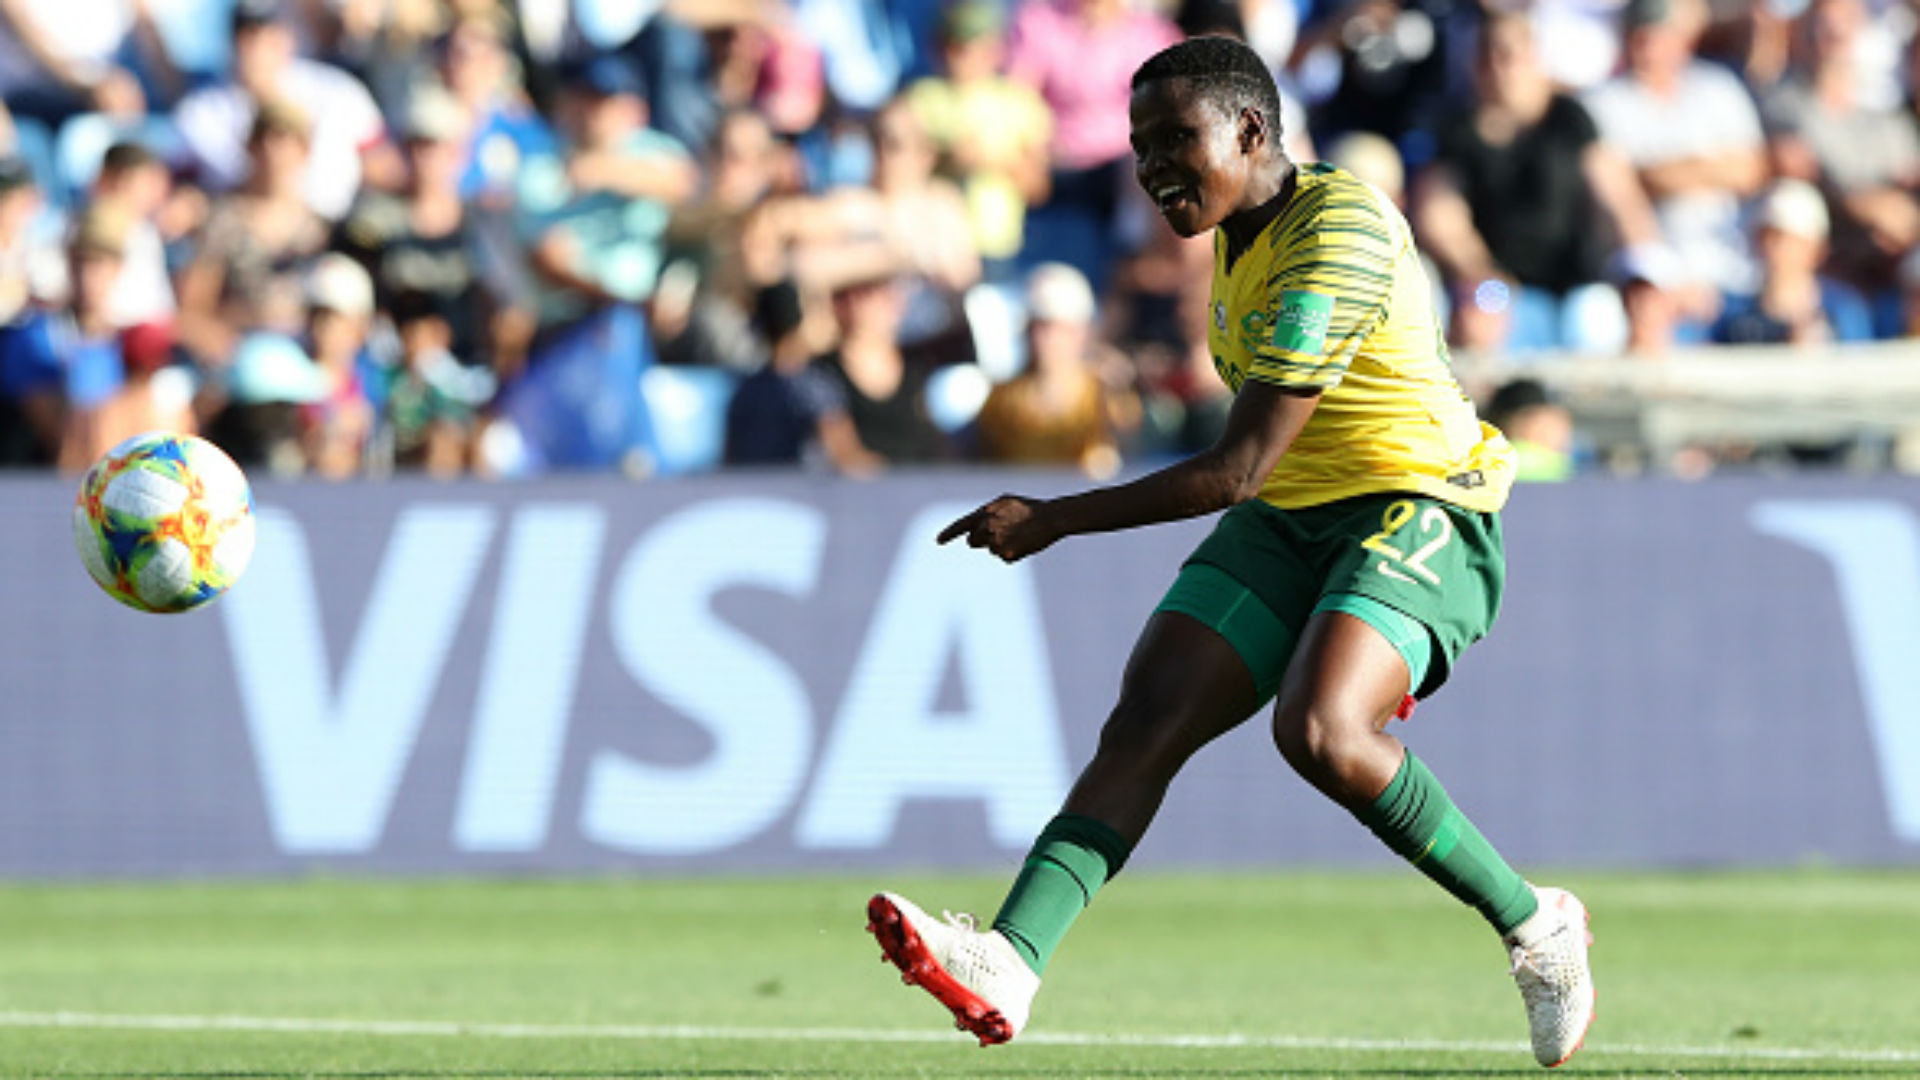 Banyana Banyana striker Mulaudzi thought Uefa Champions League dream was a scam